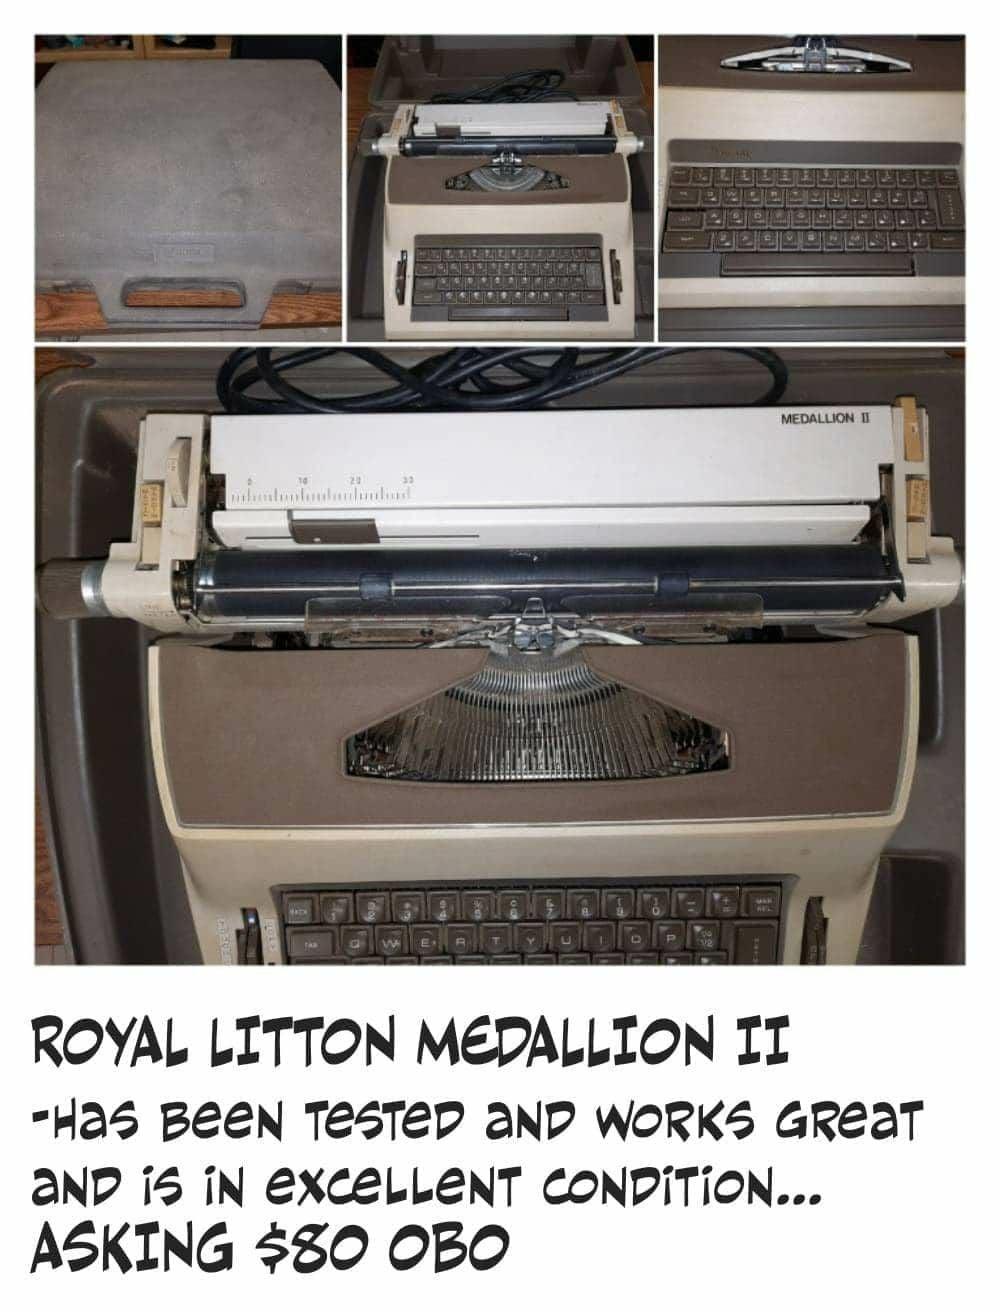 Royal Litton Medallion II